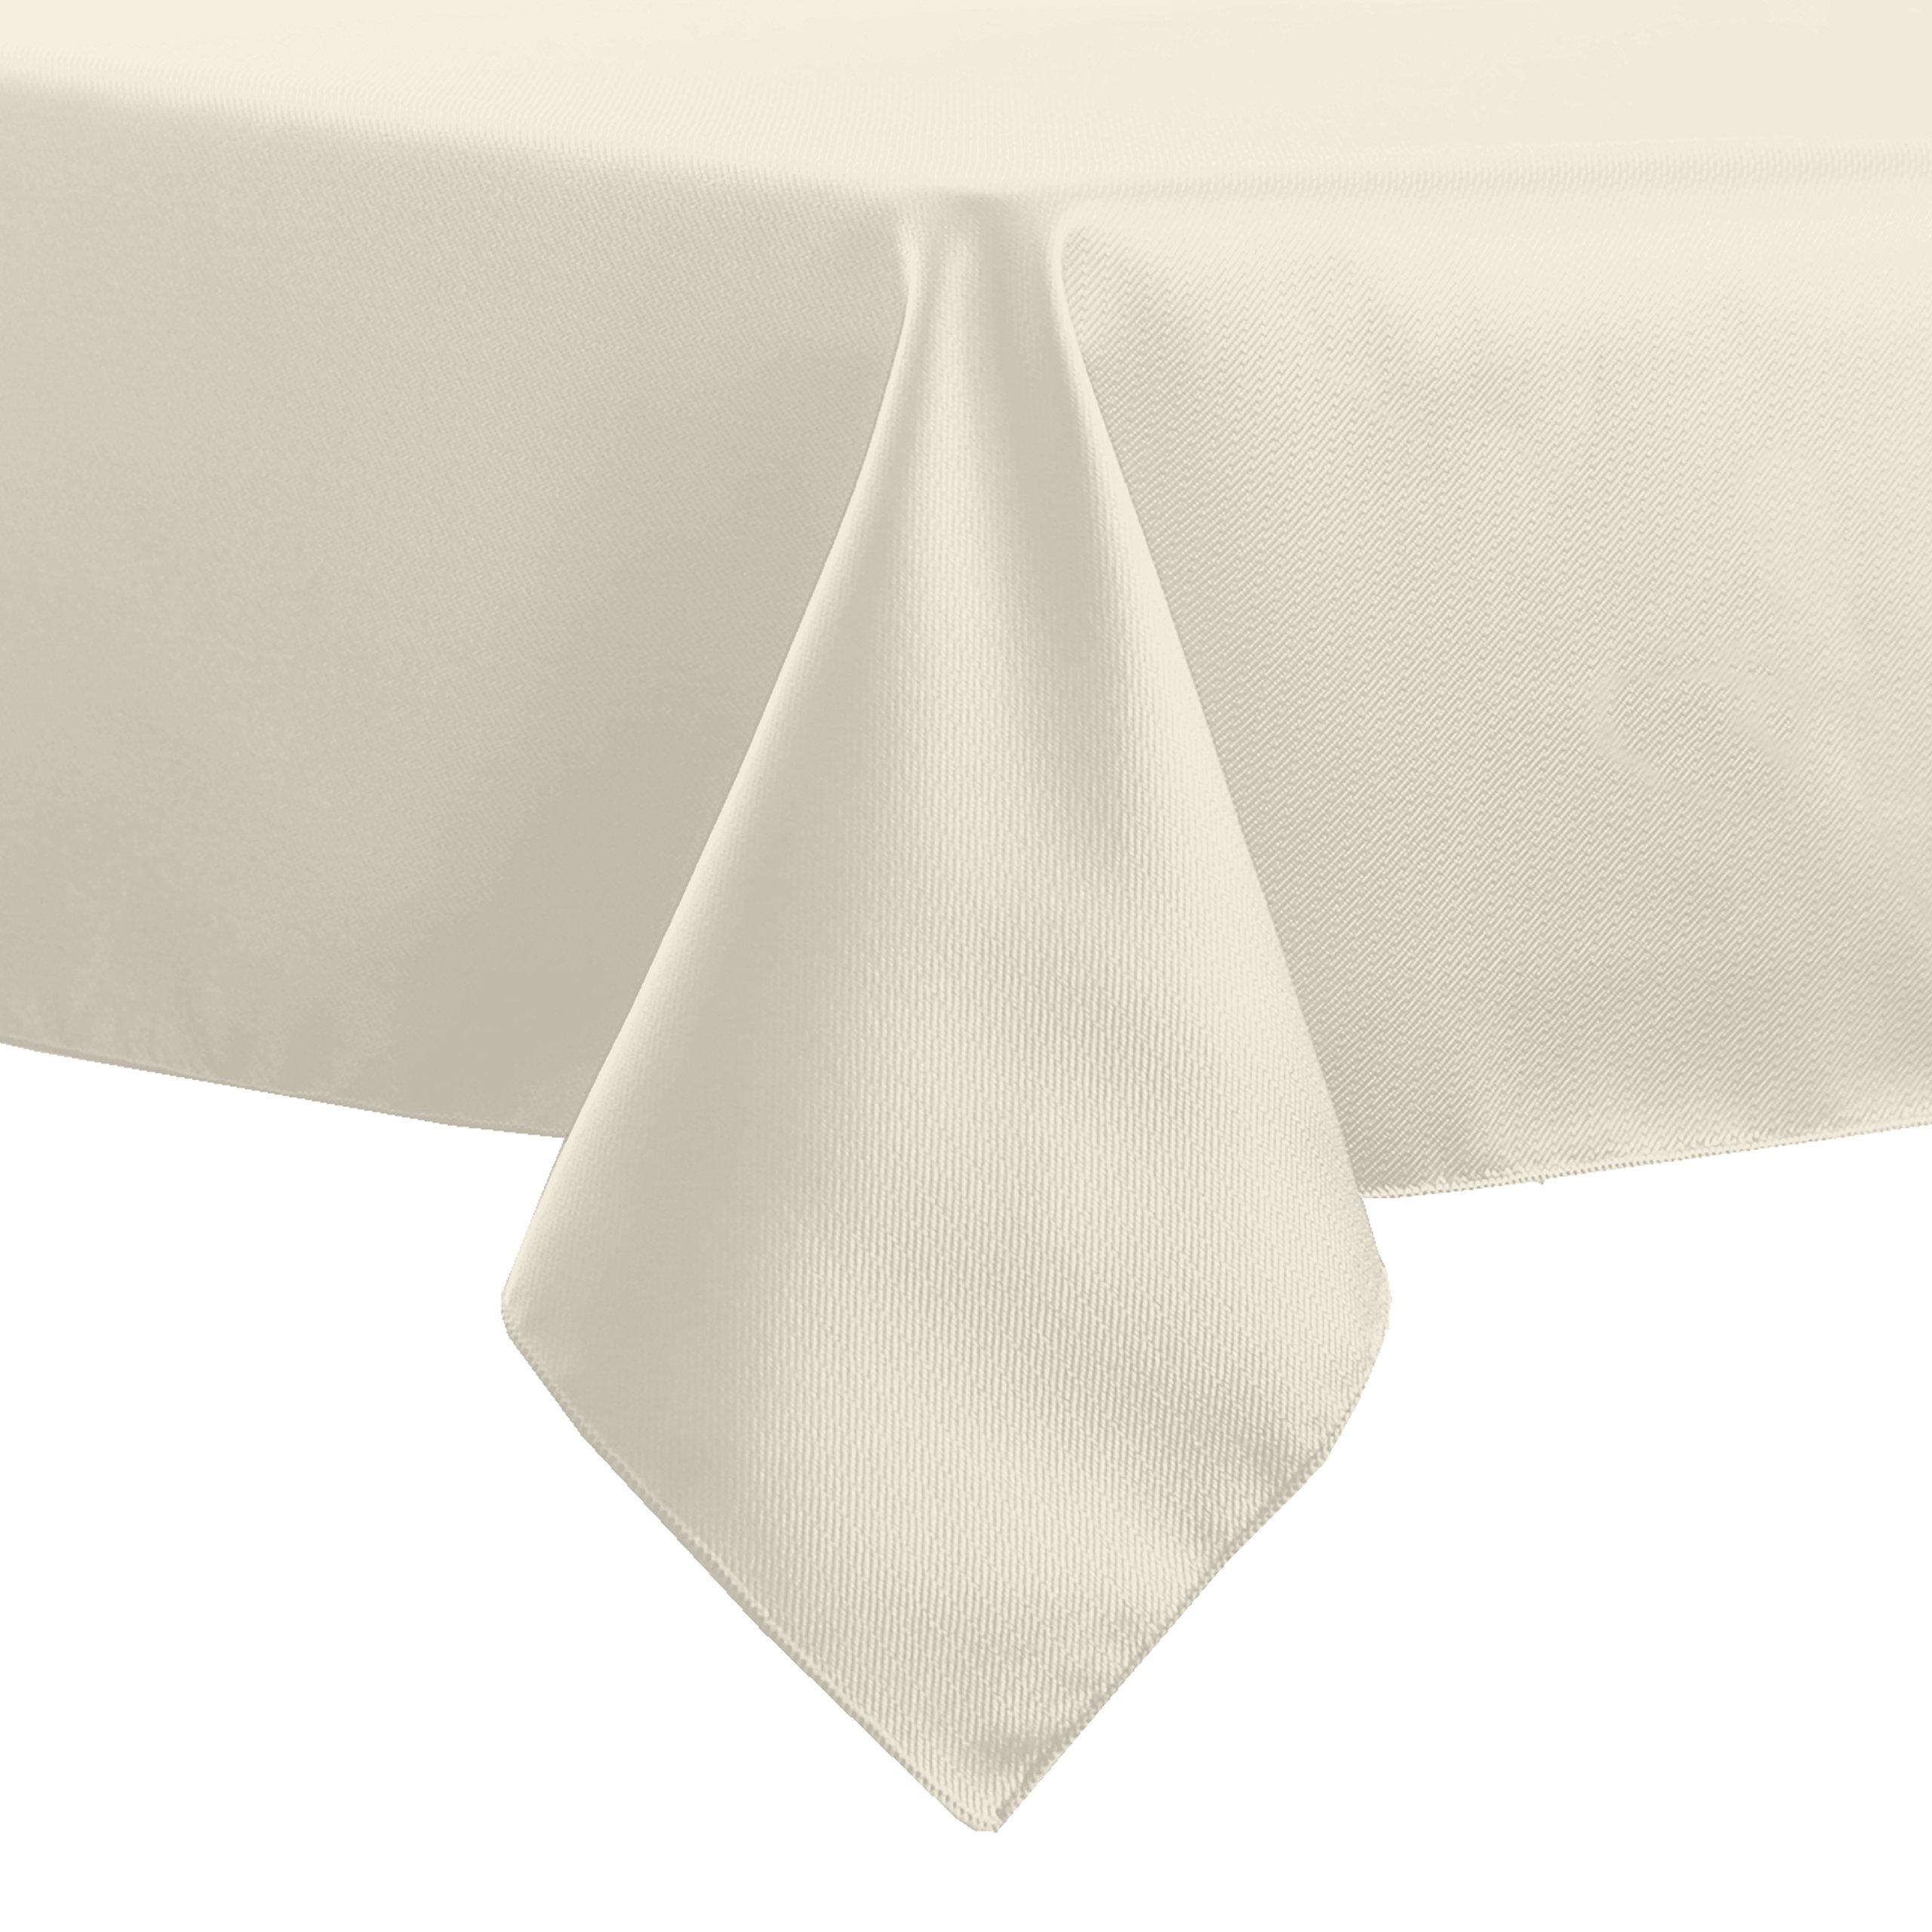 Ultimate Textile (10 Pack) Herringbone - Fandango 58-Inch Square Tablecloth, Ivory Cream